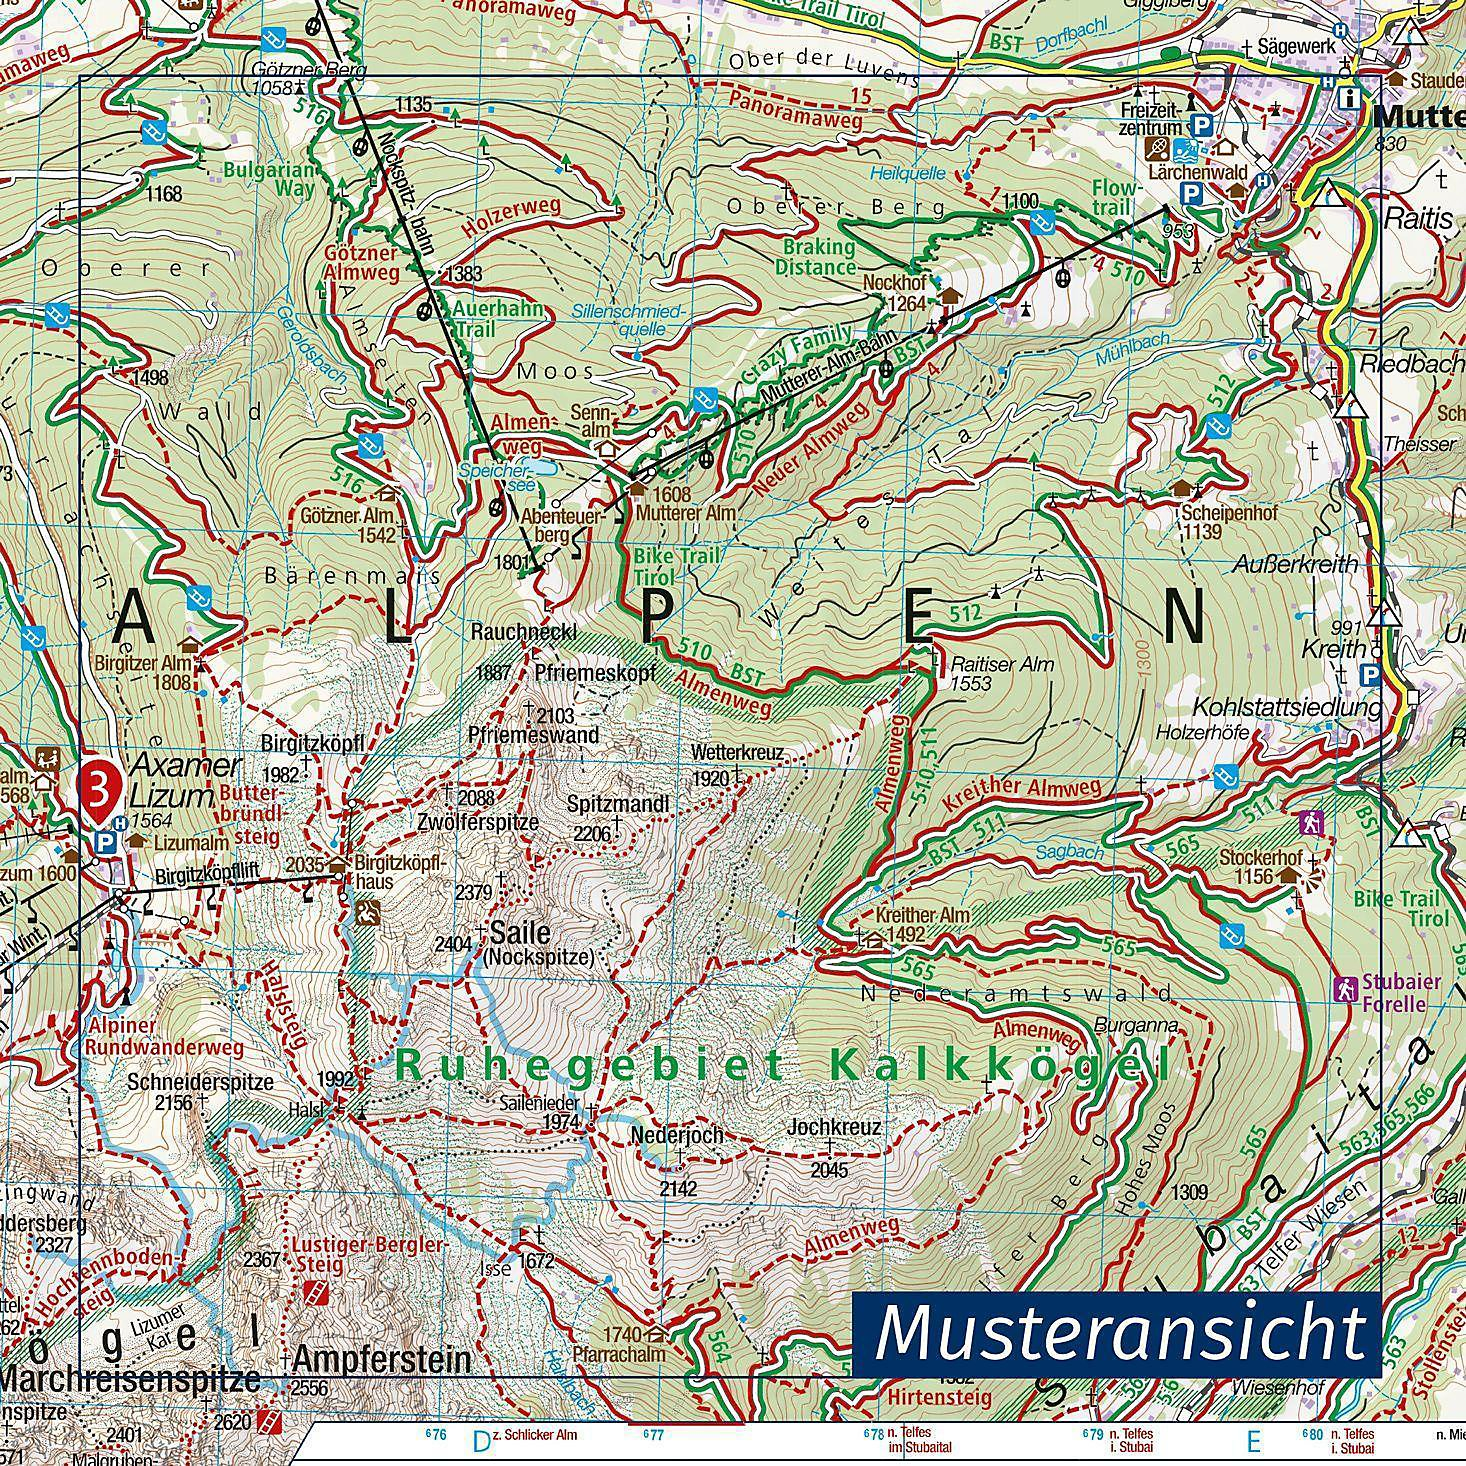 Südschwarzwald Karte.Kompass Karte St Georgen Triberg Naturpark Südschwarzwald Buch